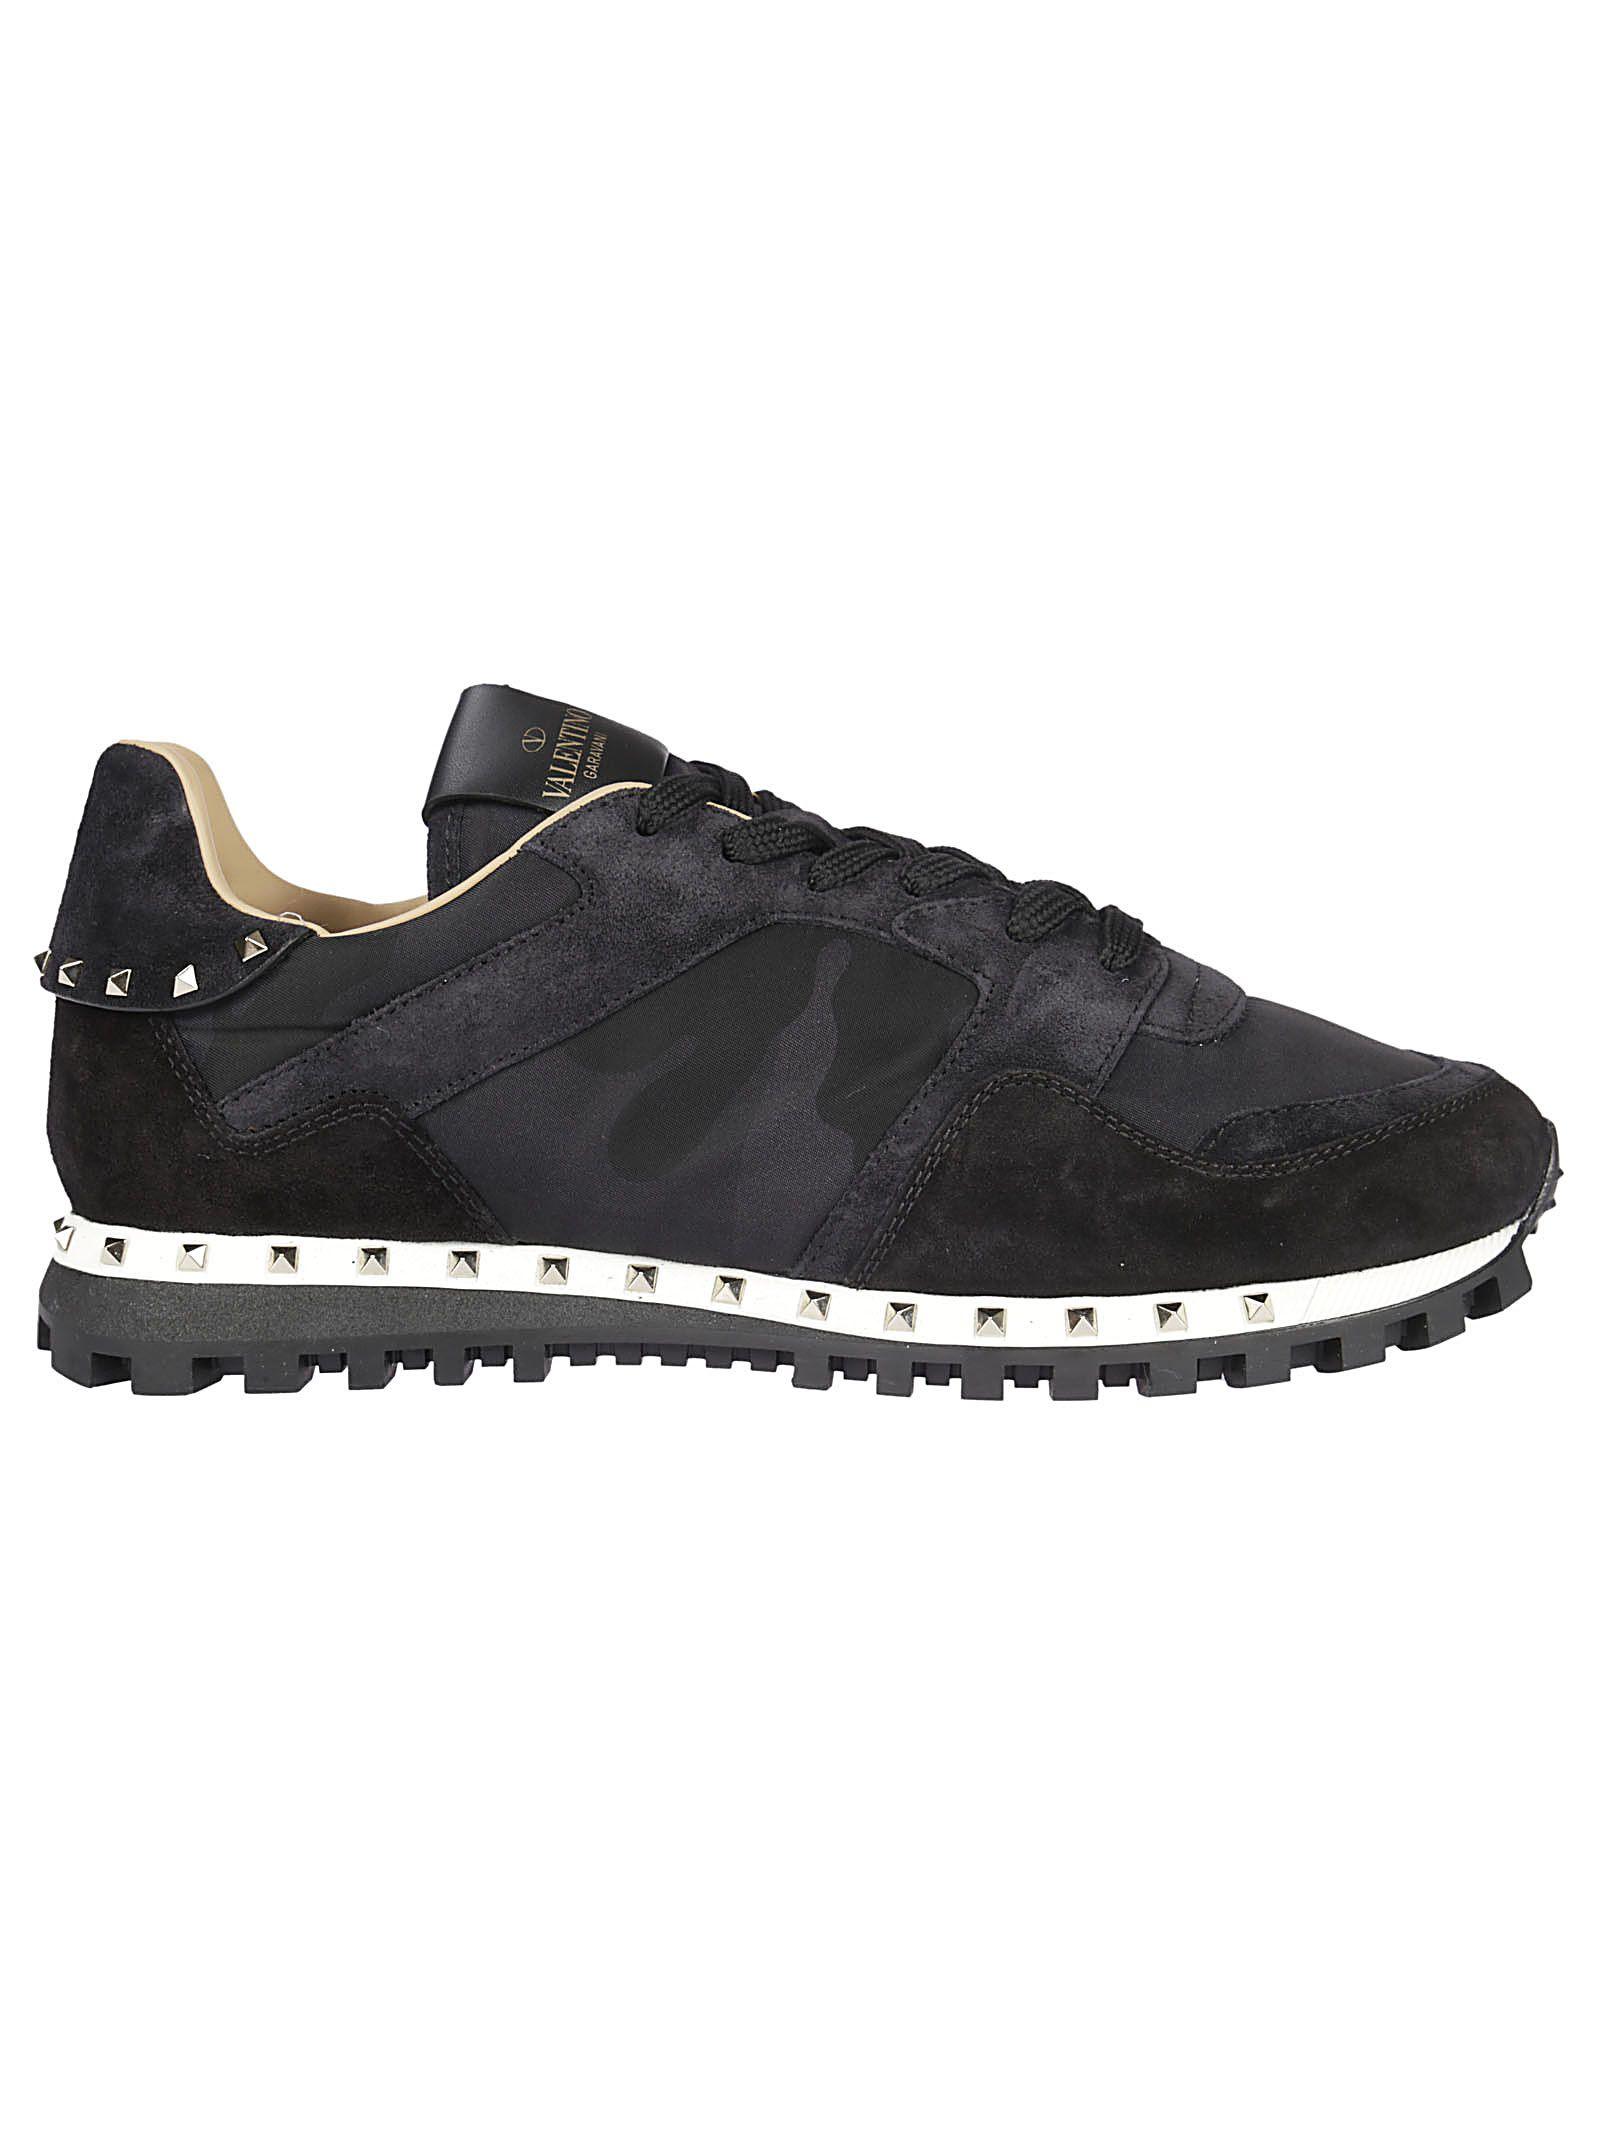 Valentino Garavani Soul Rockstud Sneakers